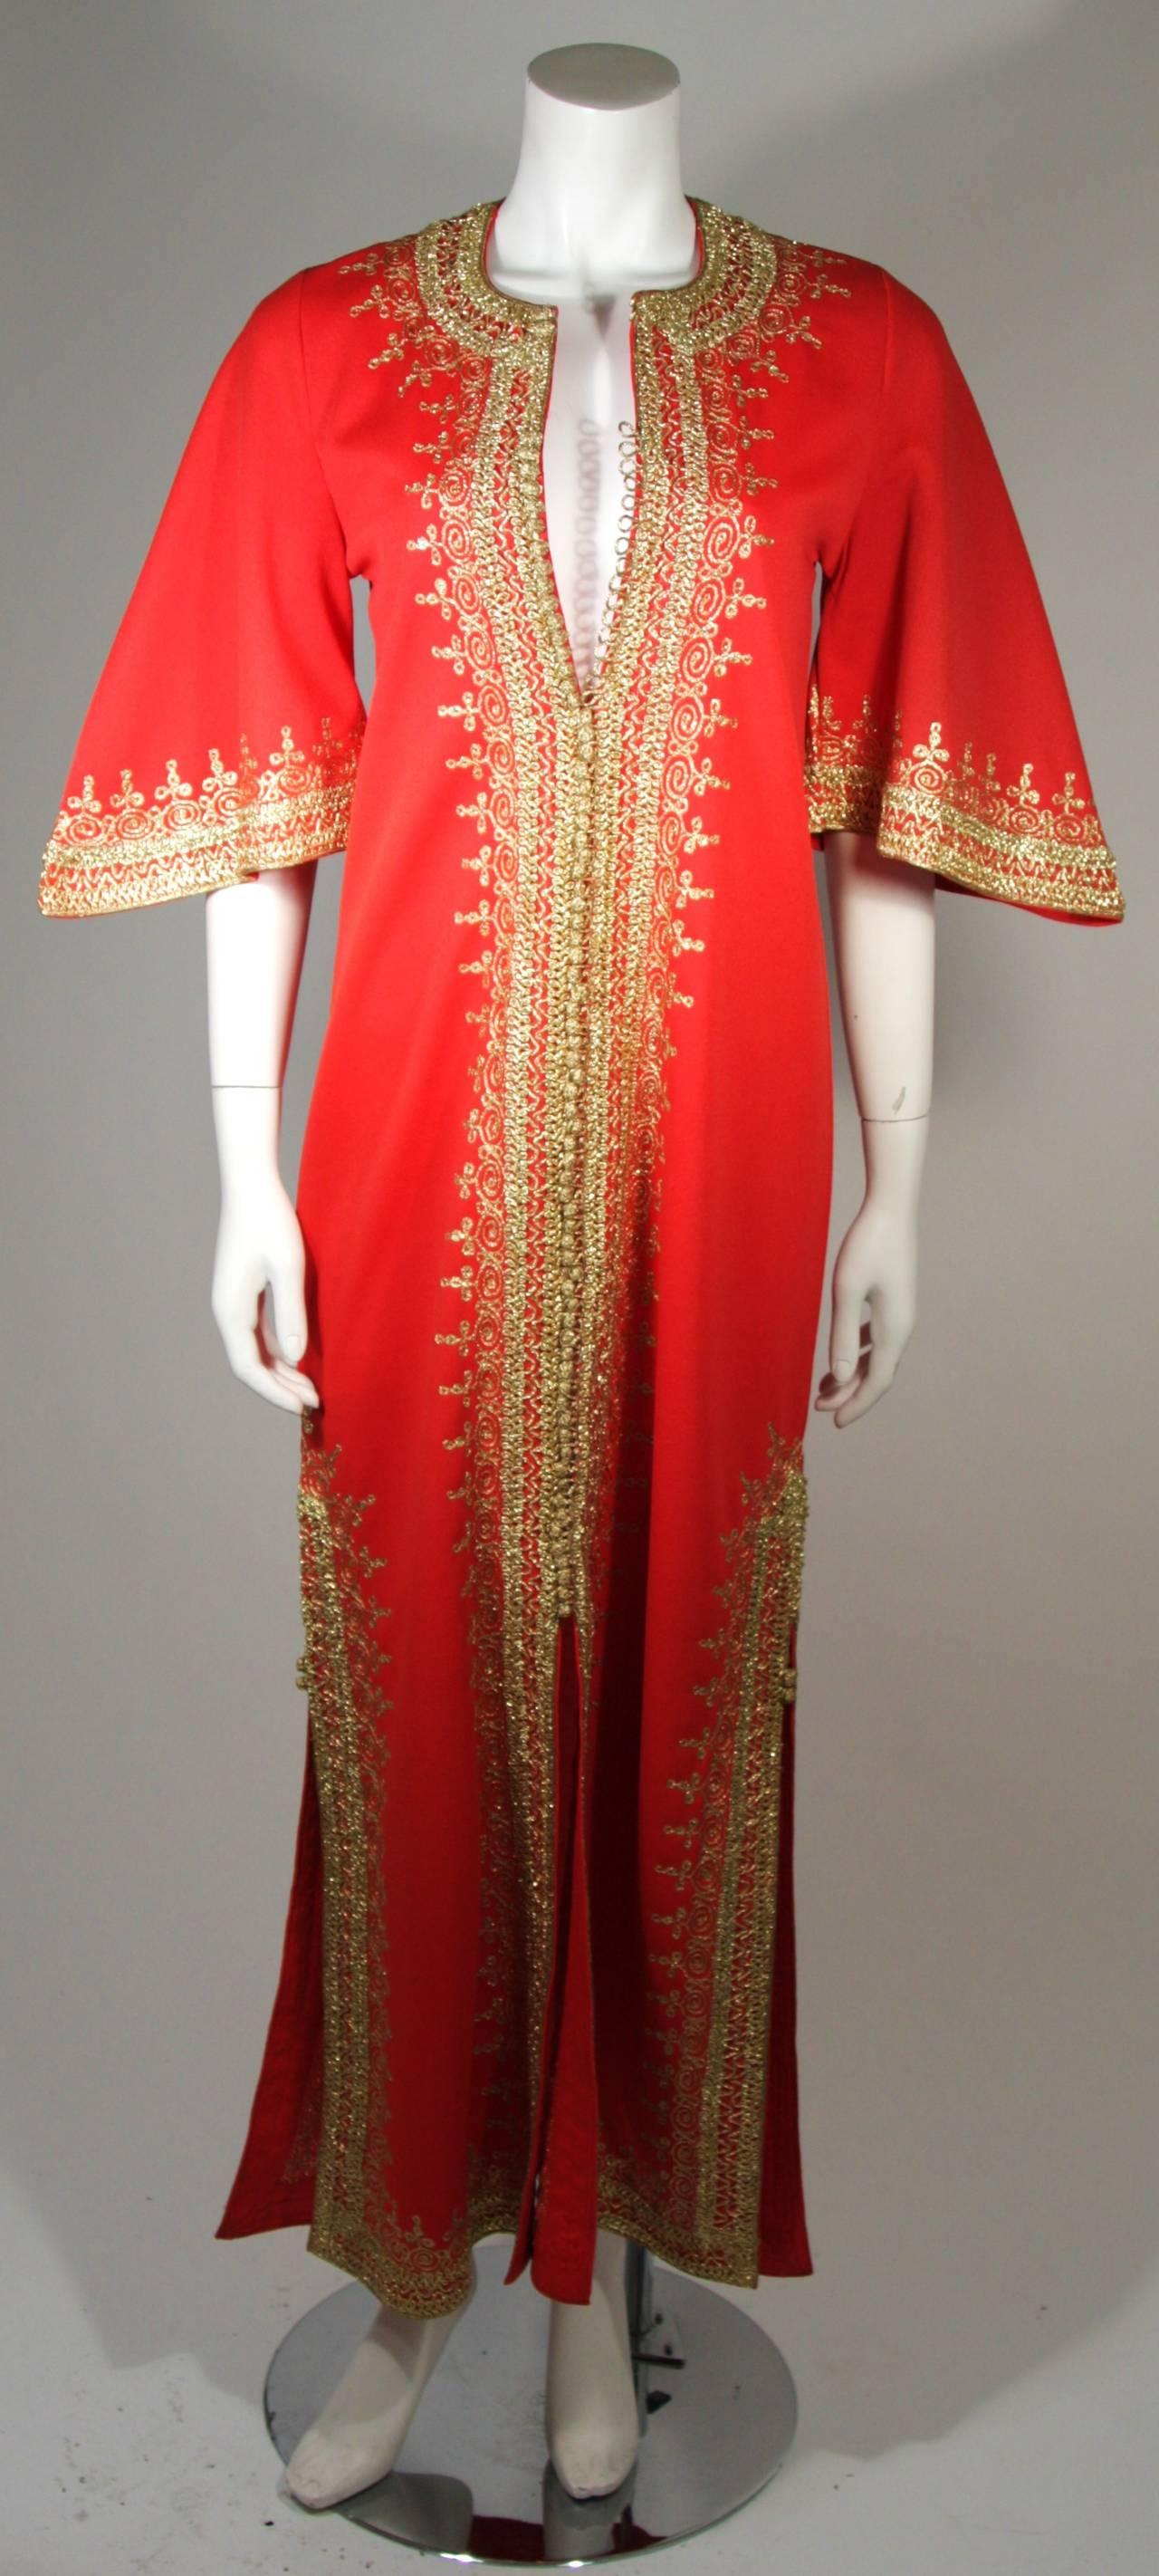 Custom Orange and Gold Indian Kaftan Size Small 2